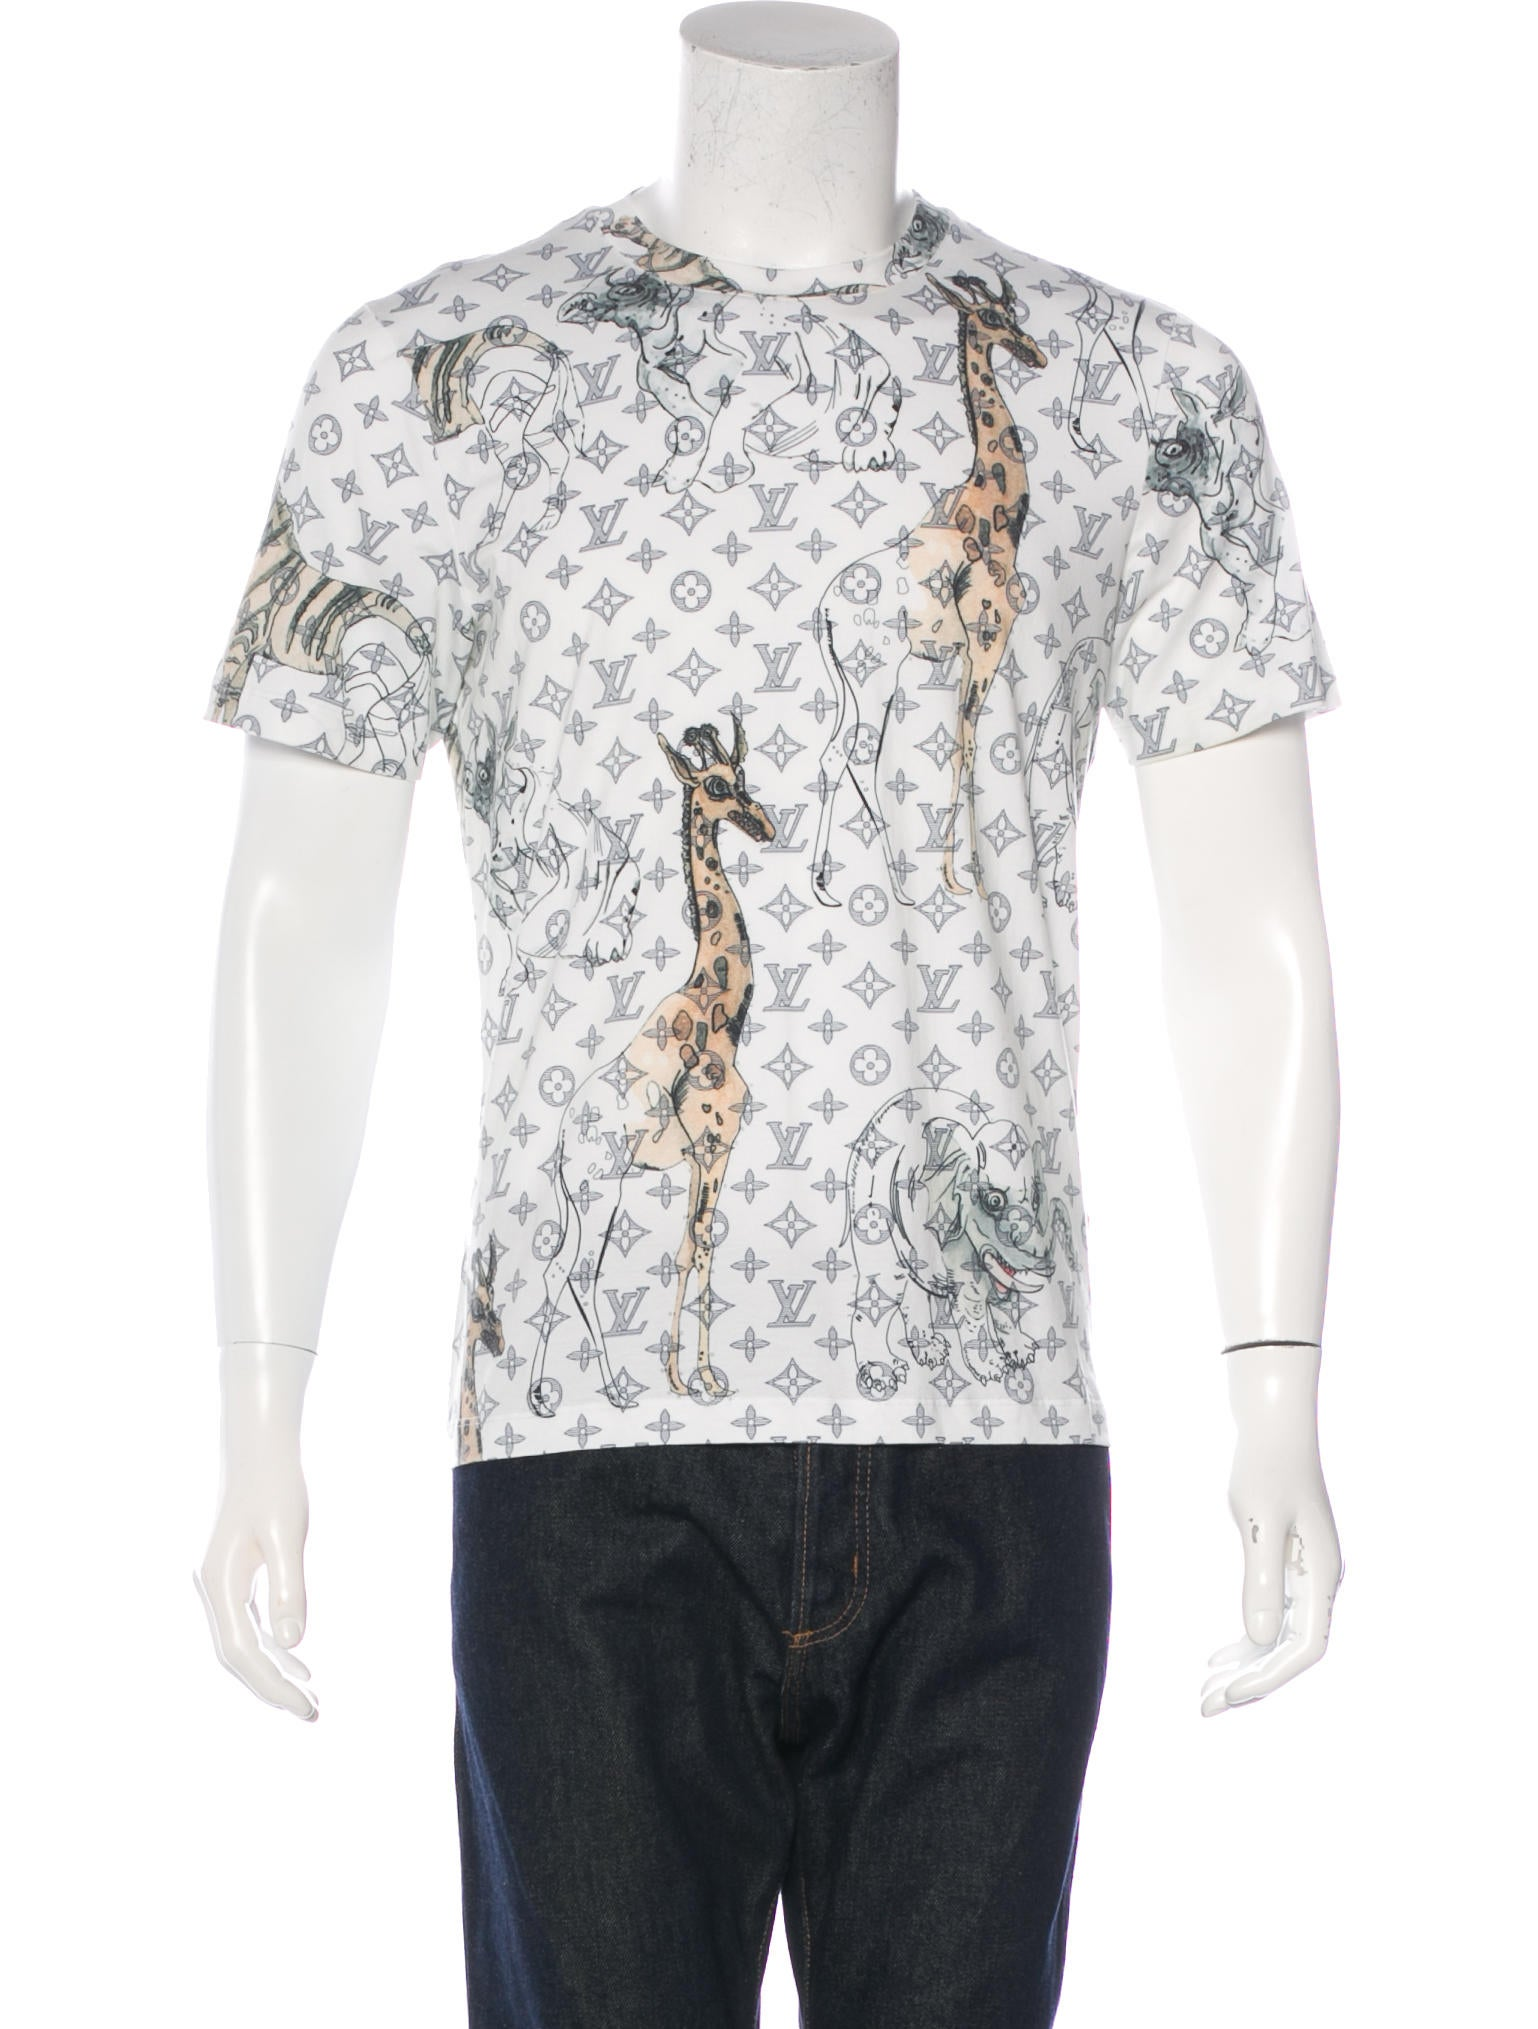 bdb65954aa6b Louis Vuitton 2017 Chapman Brothers Monogram T-Shirt - Clothing ...